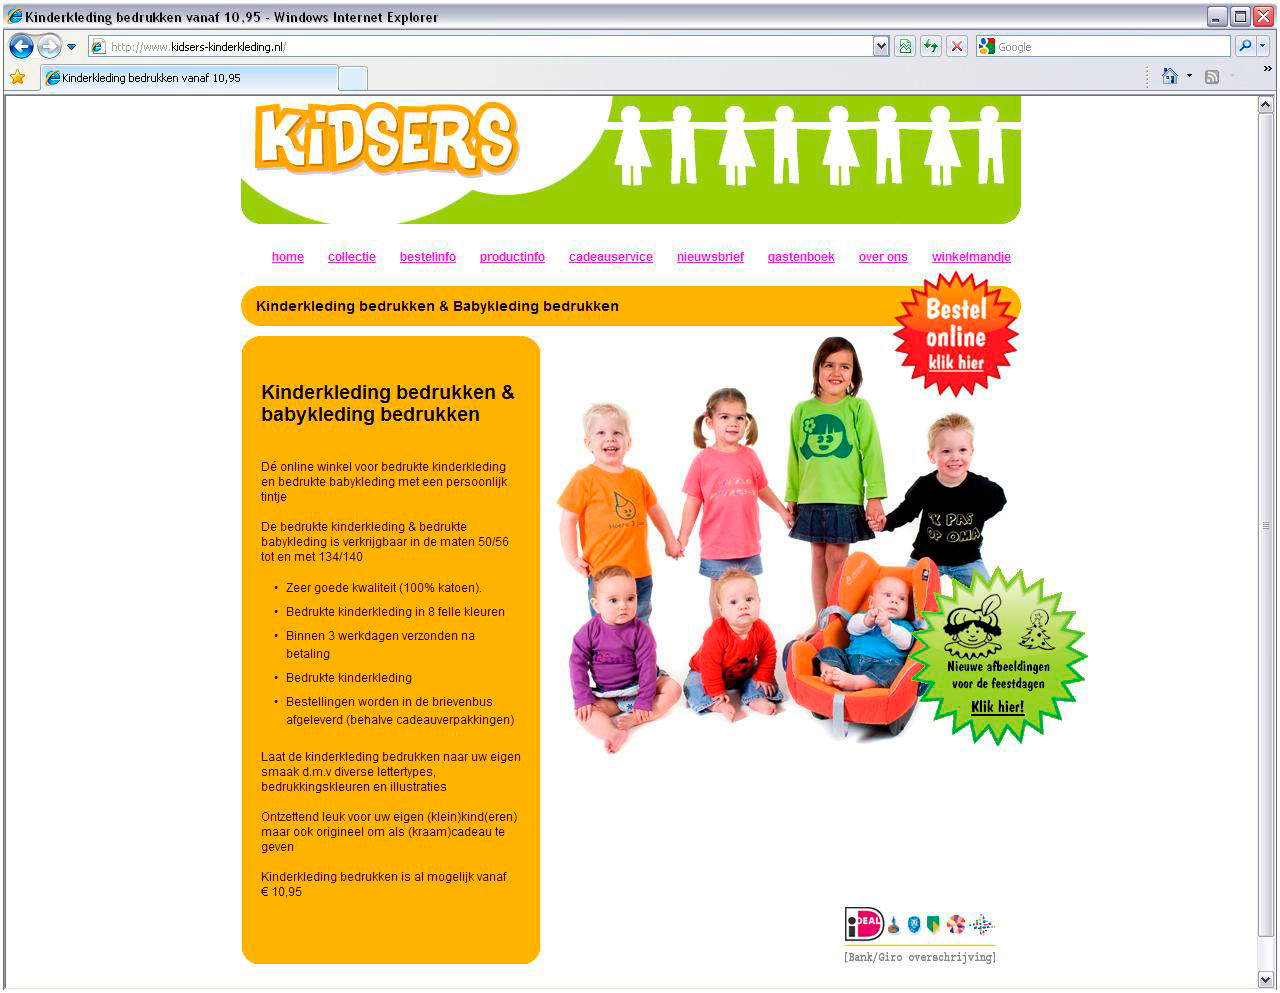 www.kidsers.nl